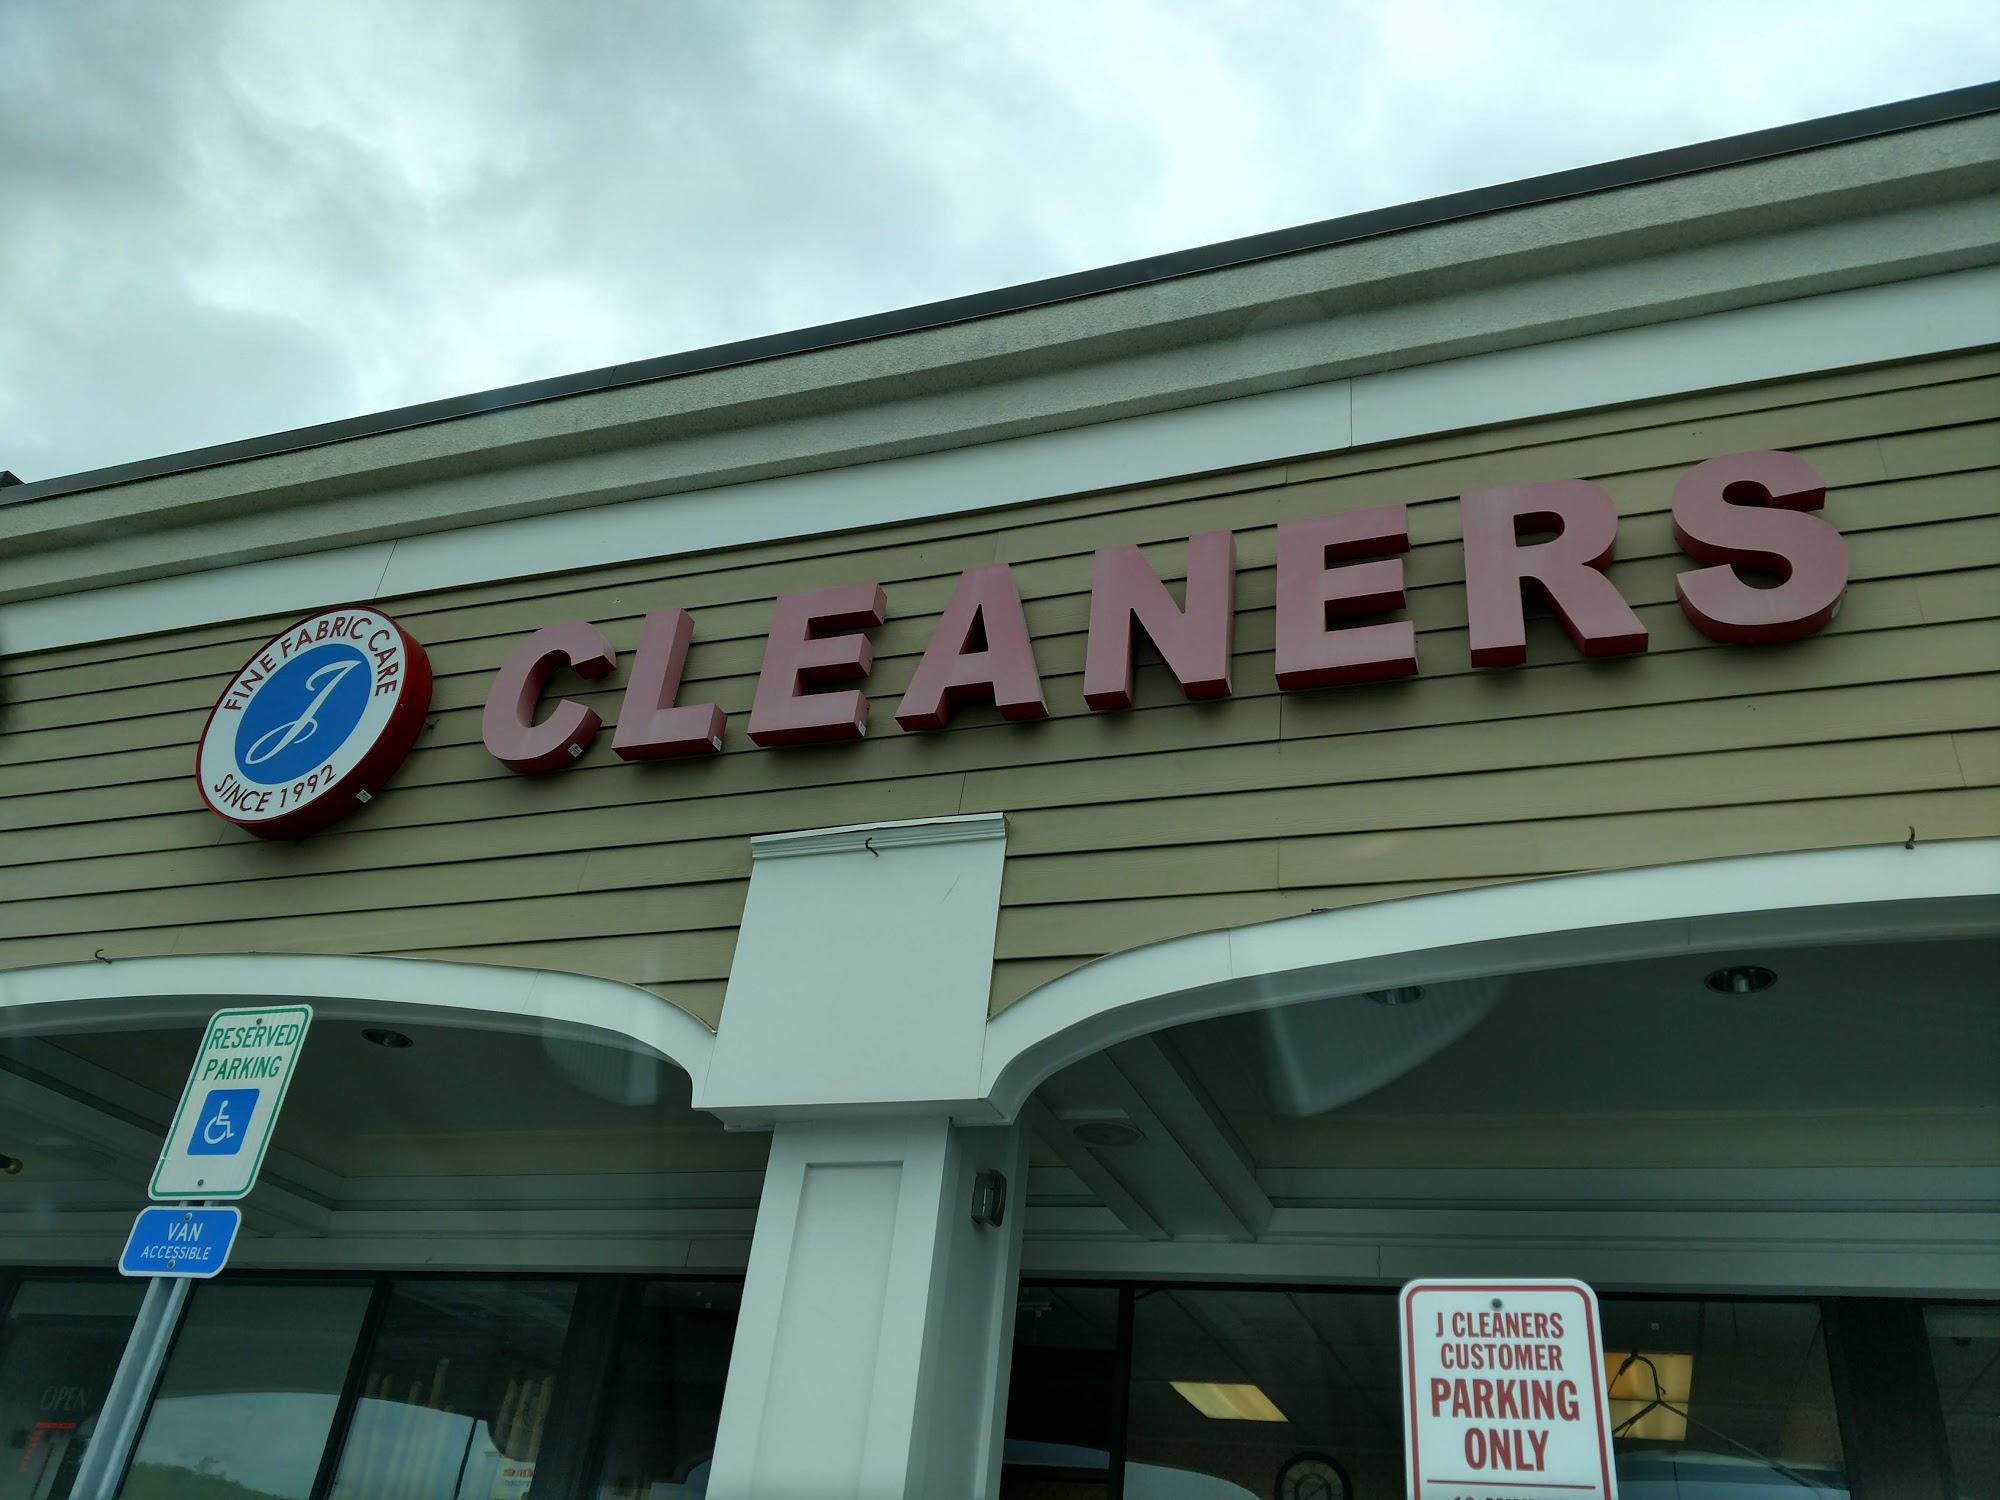 J Cleaners 112 Boston Turnpike, Shrewsbury